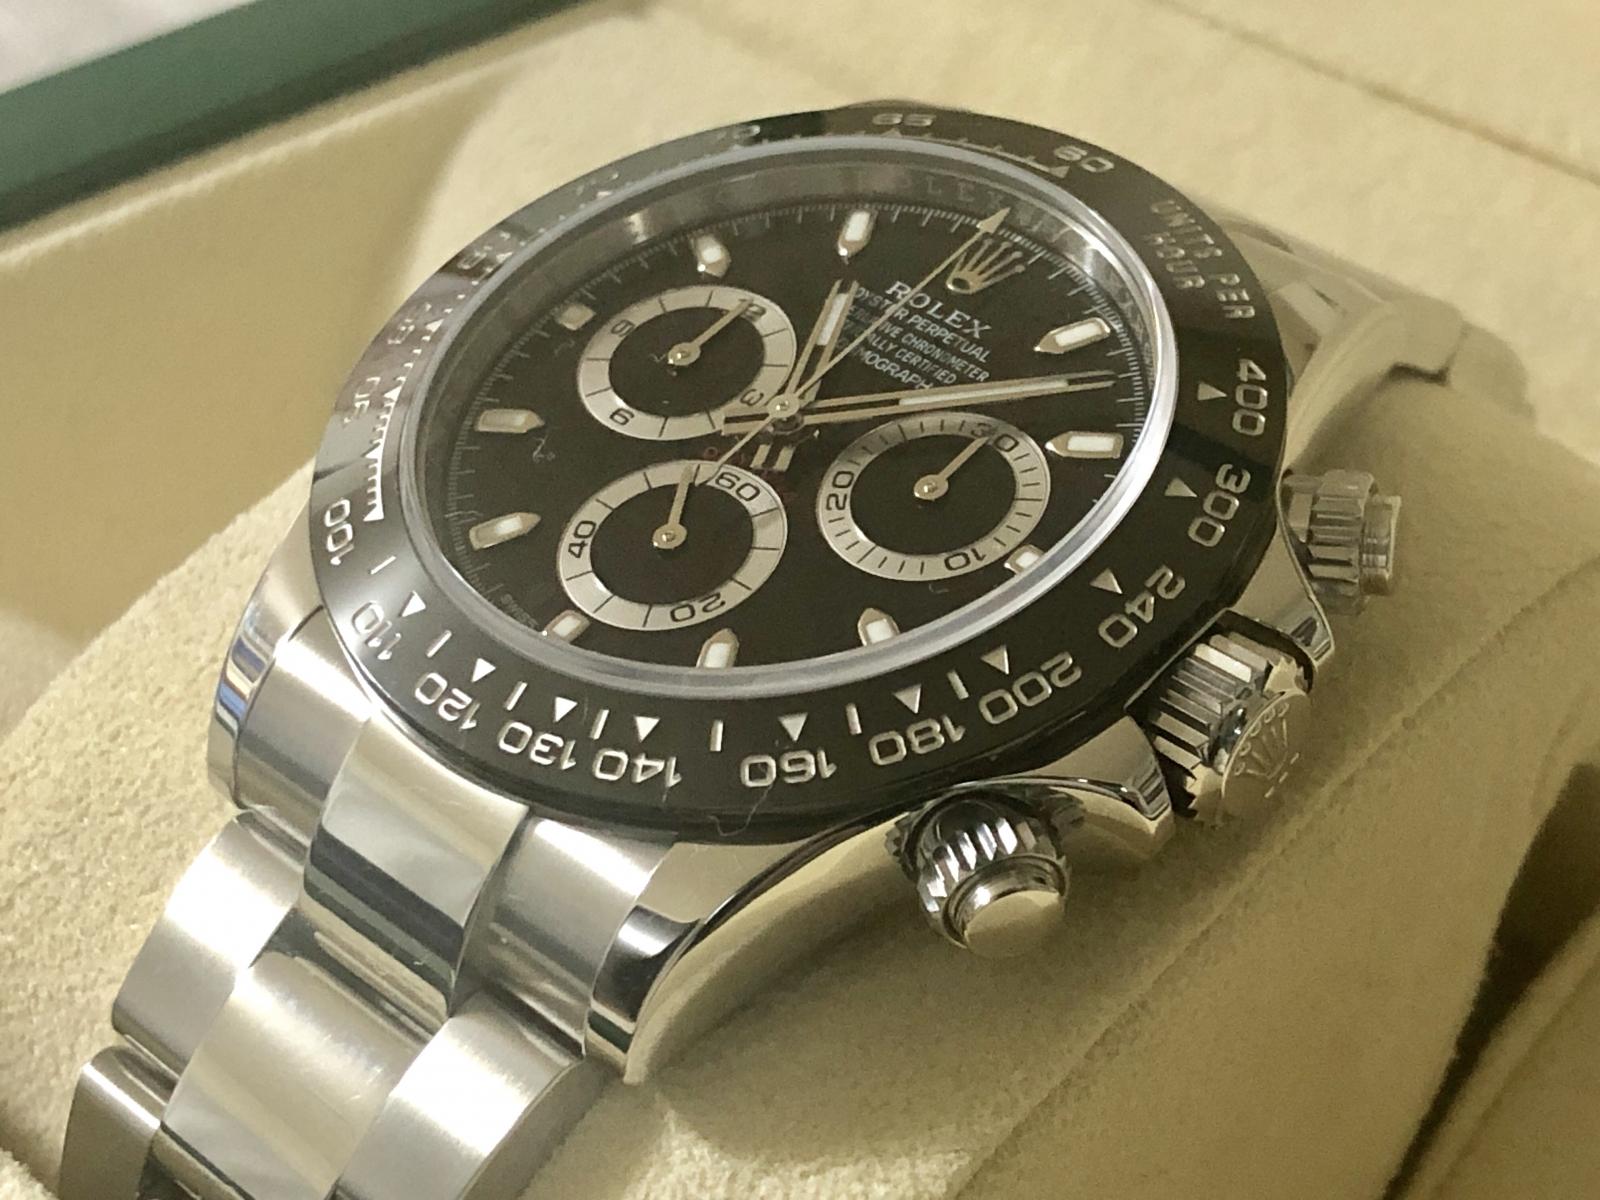 buy popular c9460 bd1fb ホーム :: トケマー :: ROLEX / ロレックス :: 新品未使用 最新モデル ROLEX ロレックス コスモグラフ デイトナ ブラック  116500LN メンズ腕時計 ステンレスS / セラクロム